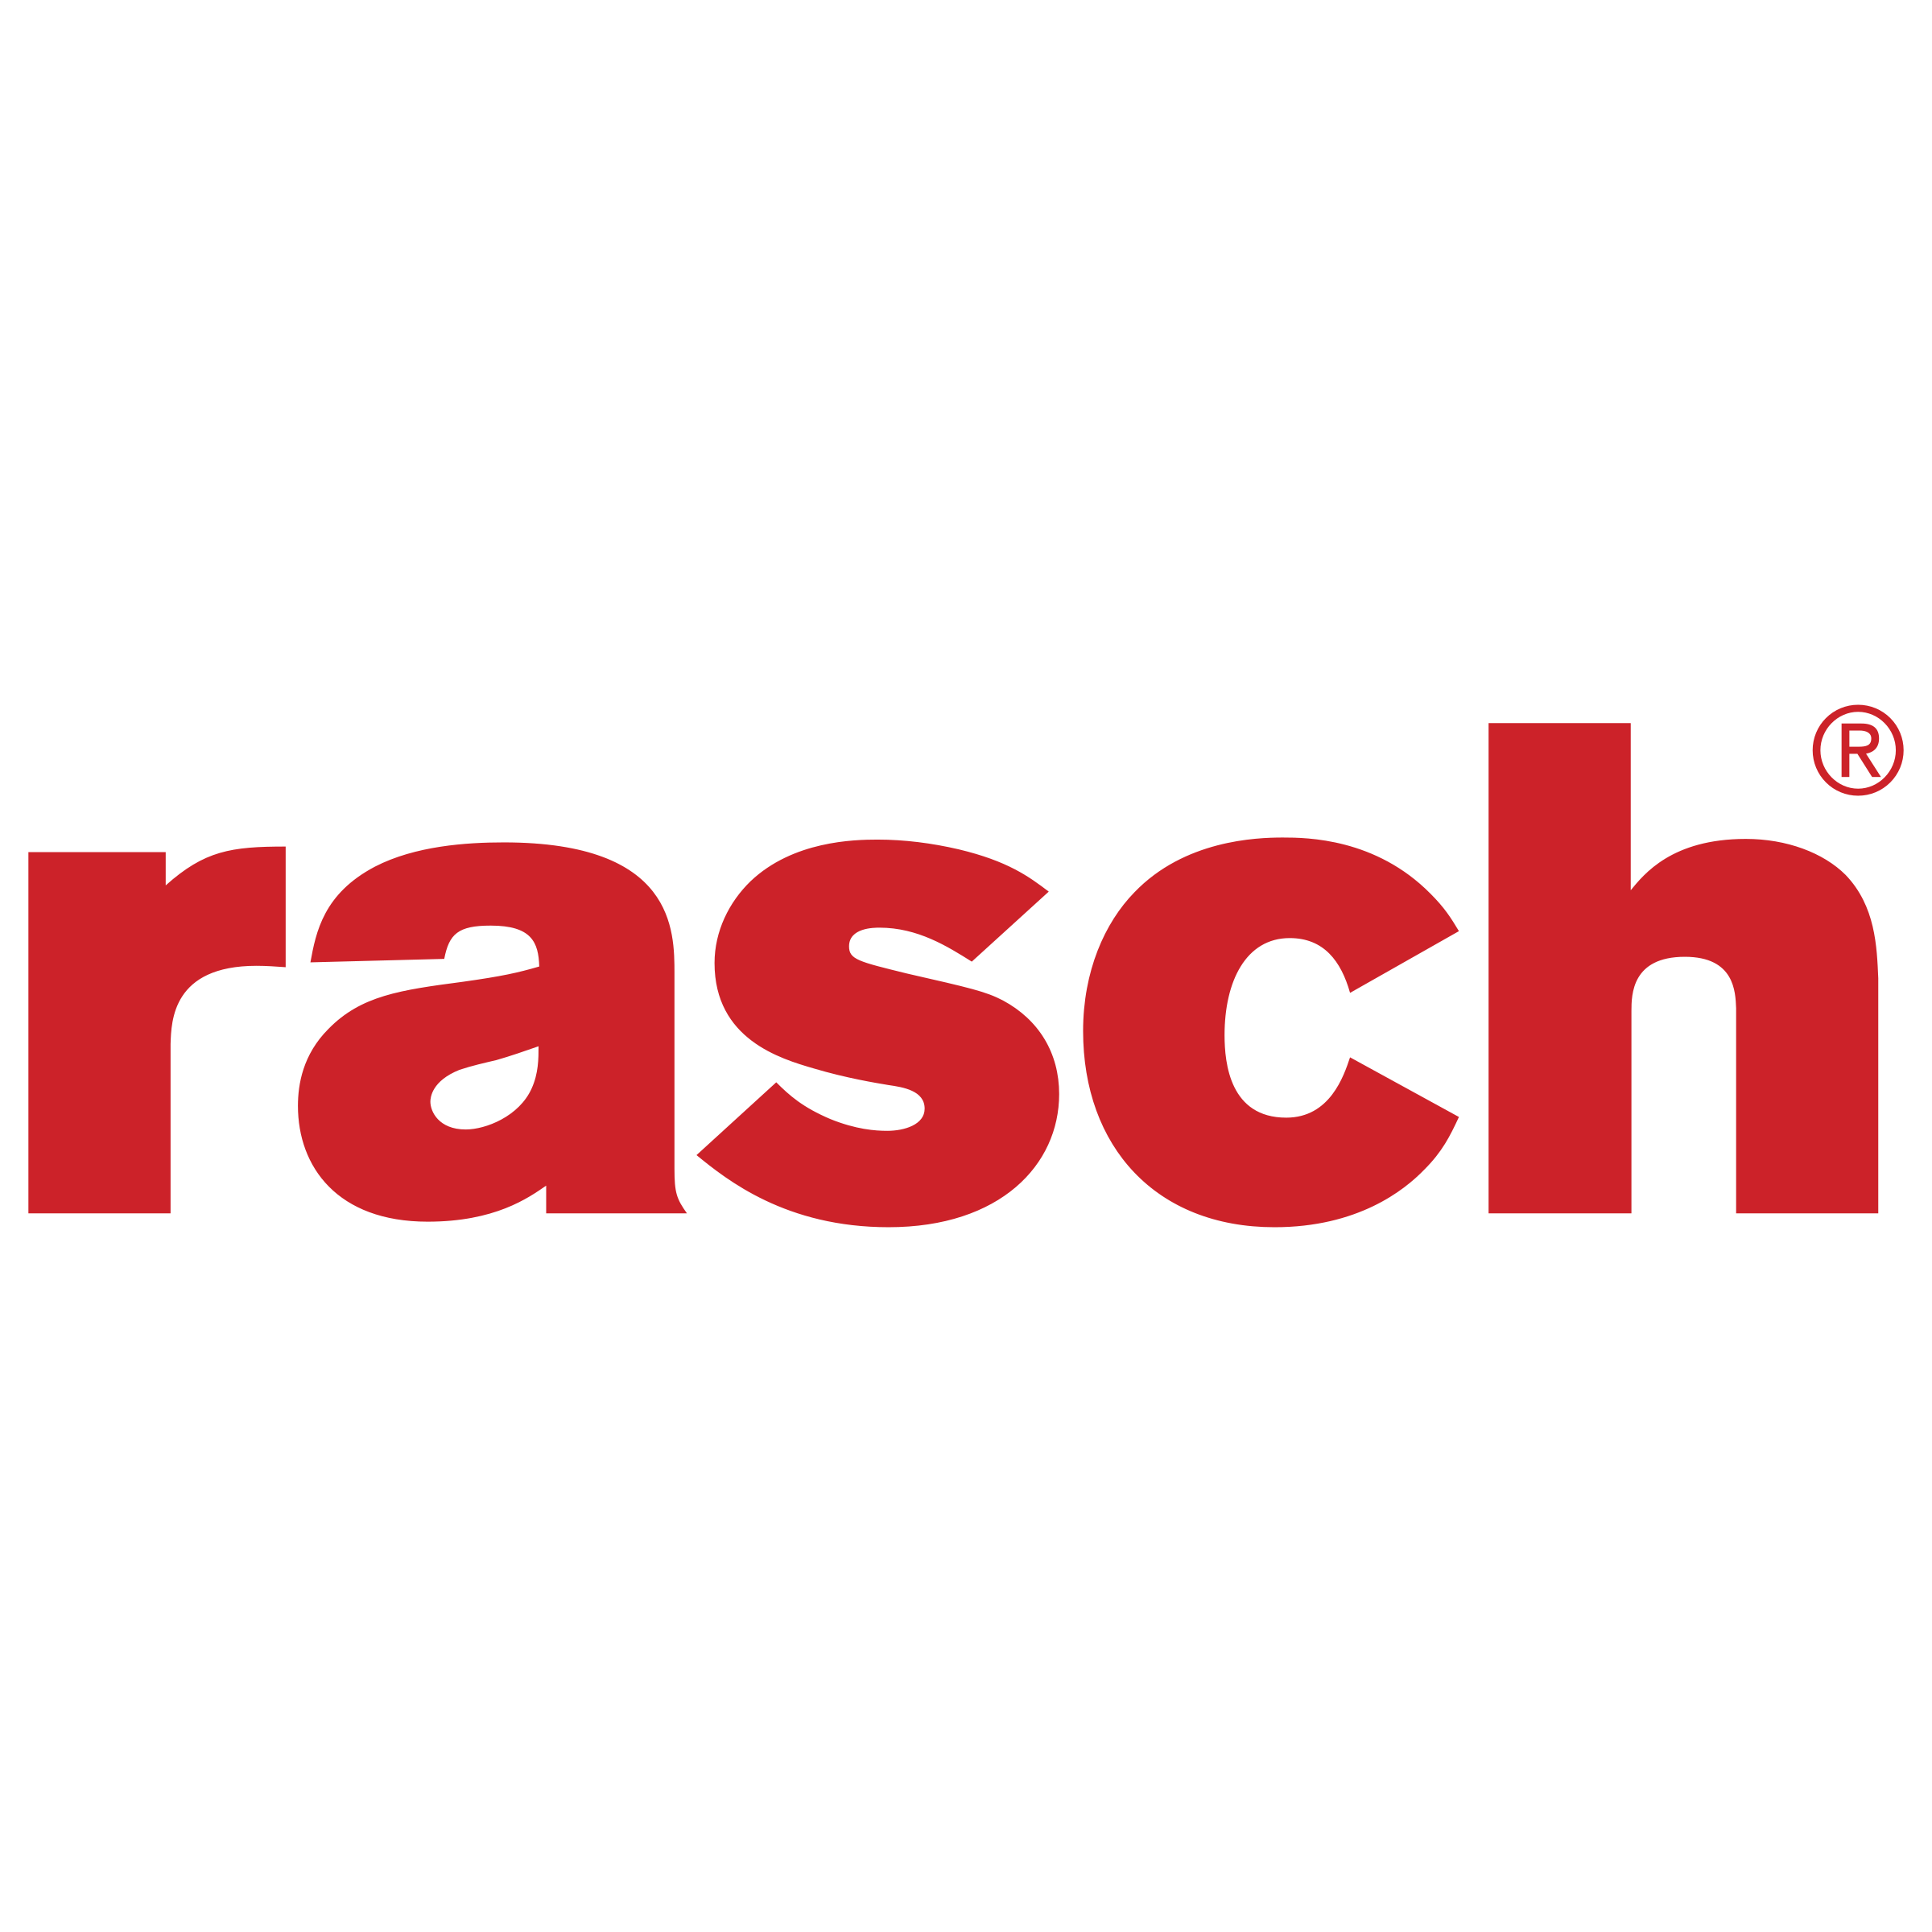 Rasch Logo Png Transparent